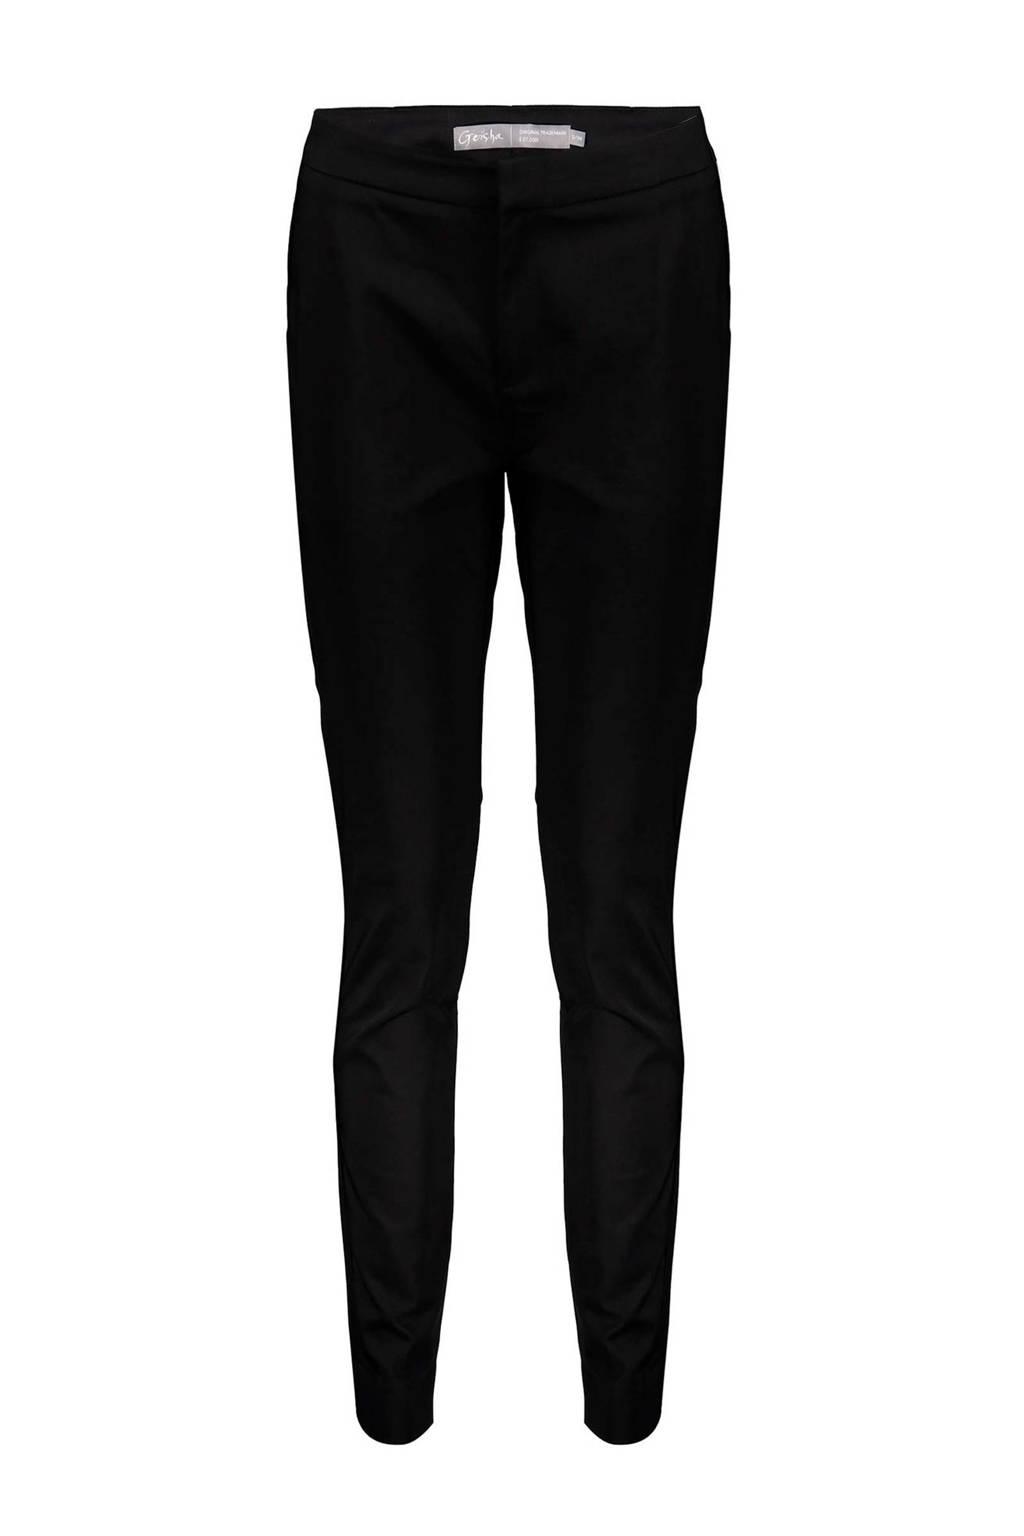 Geisha skinny broek zwart, Zwart